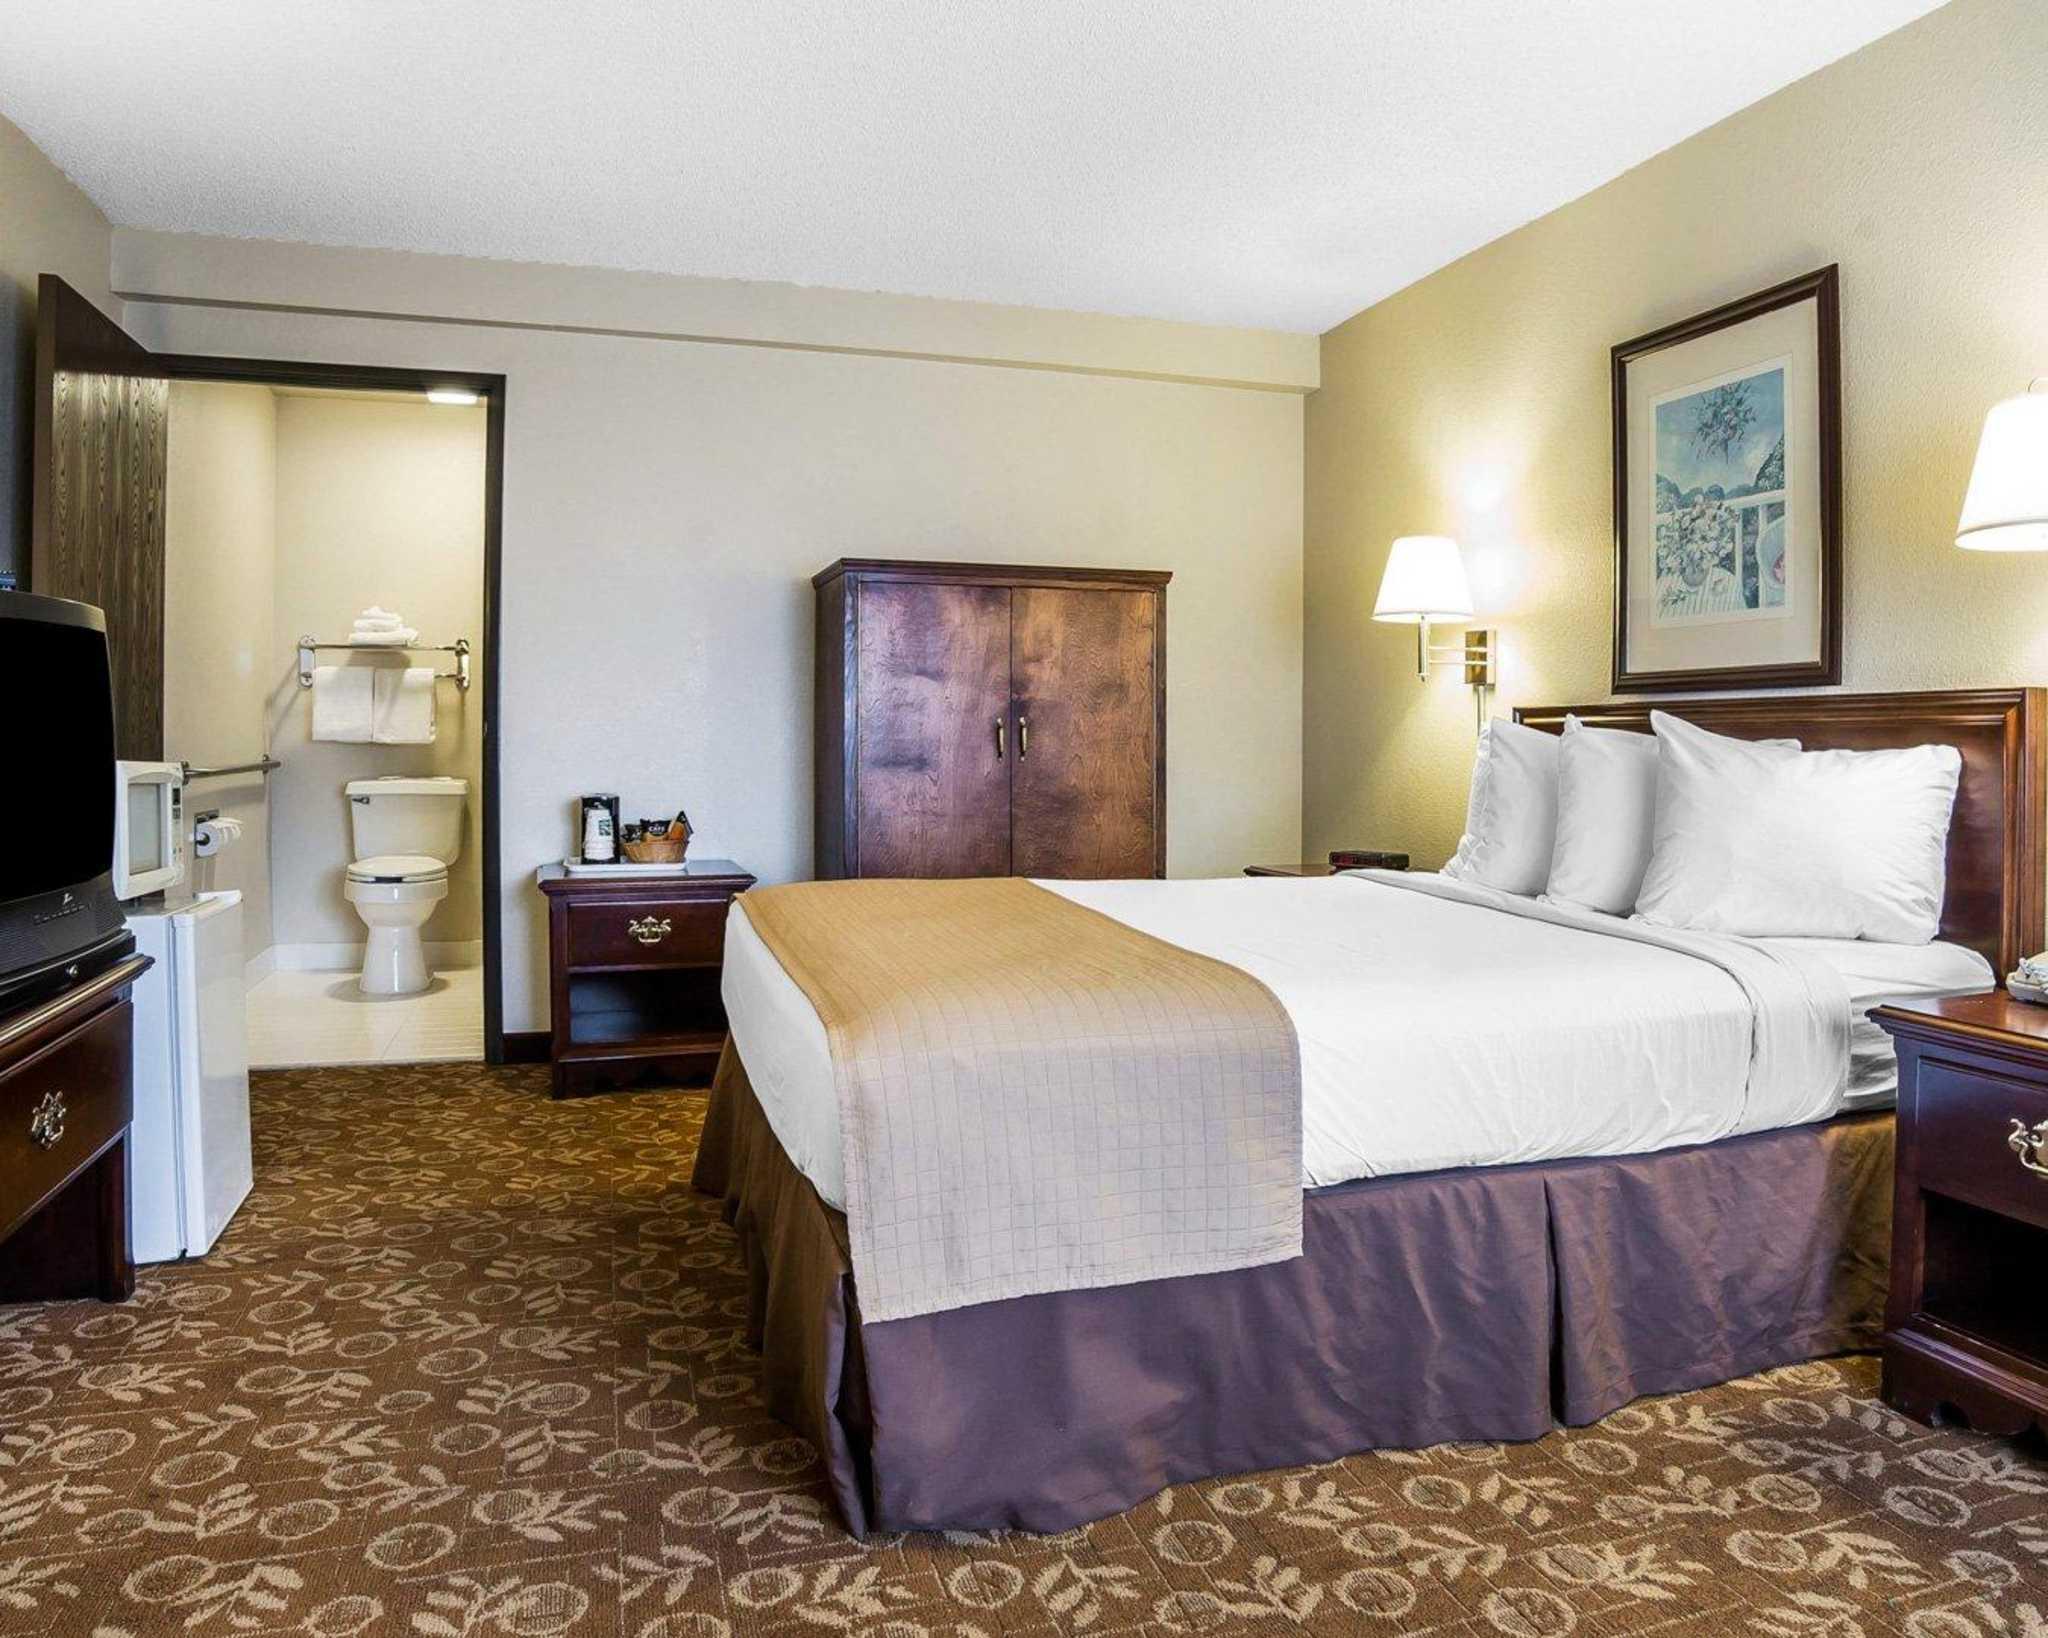 Quality Inn & Suites Minden US-395 image 3